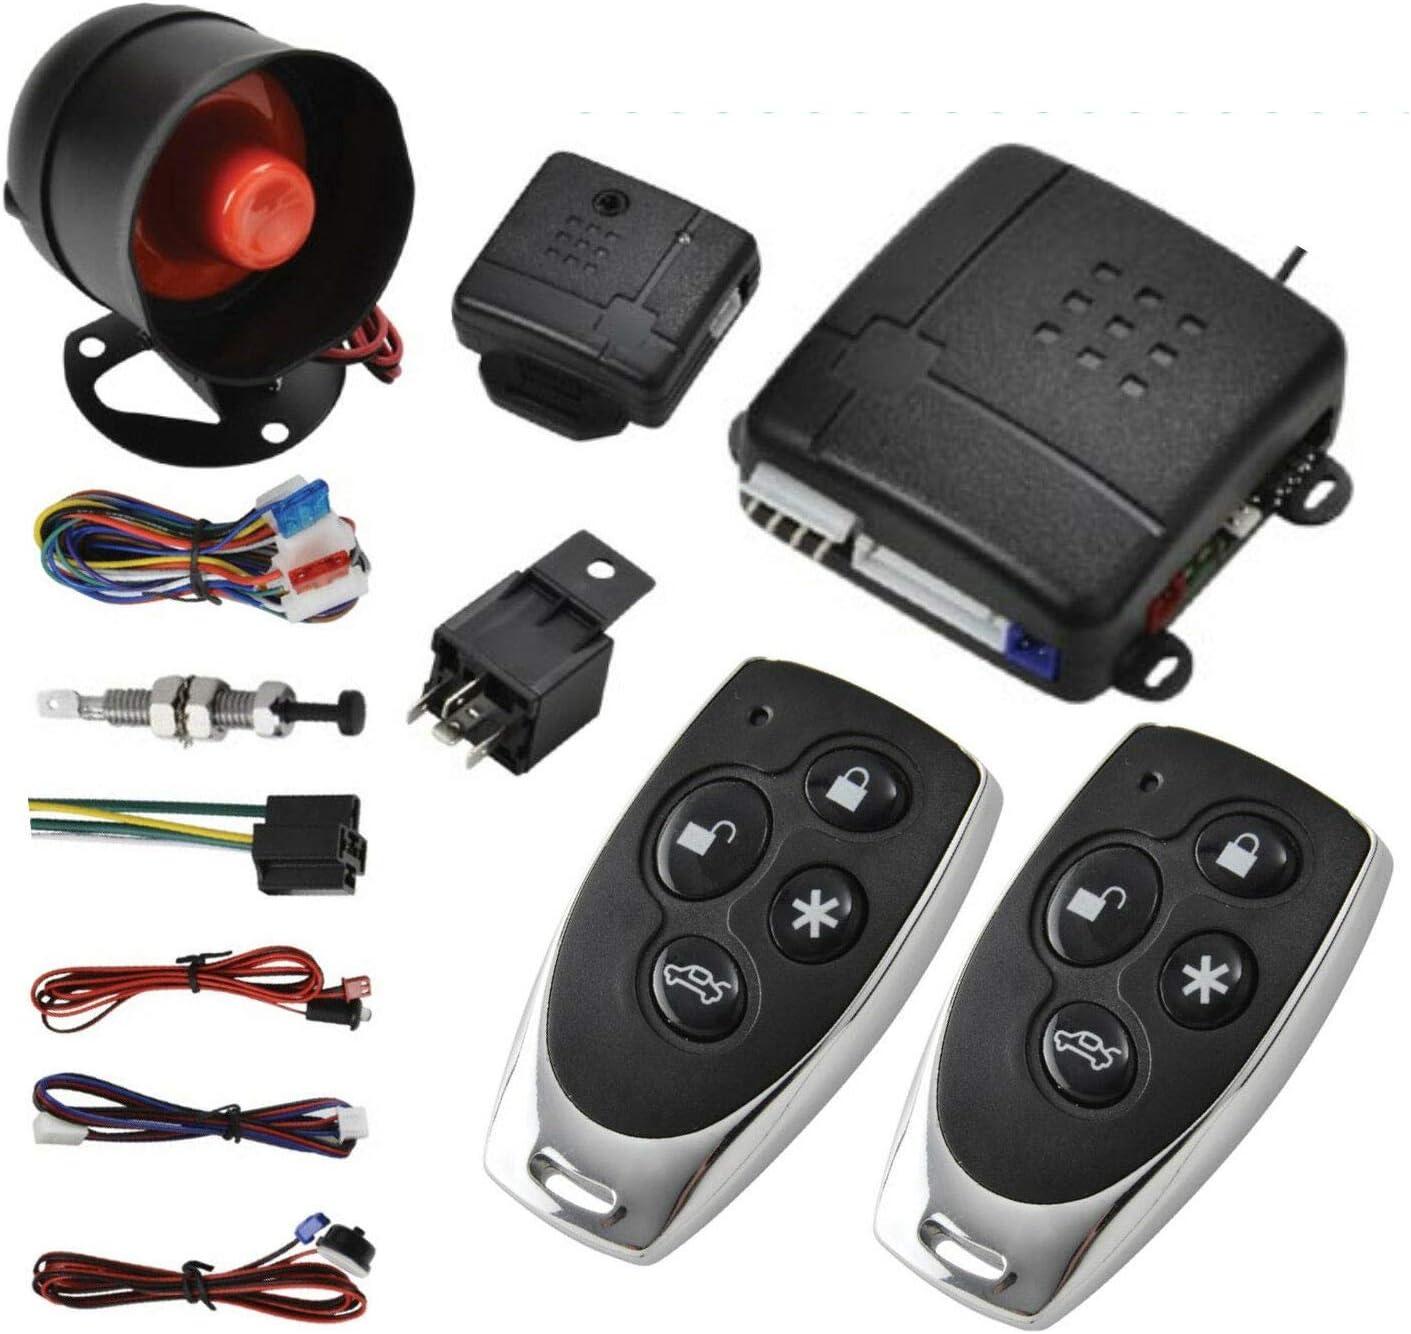 MASO Car Central favorite Spring new work Lock Universal Auto Vehicle Kit Remote